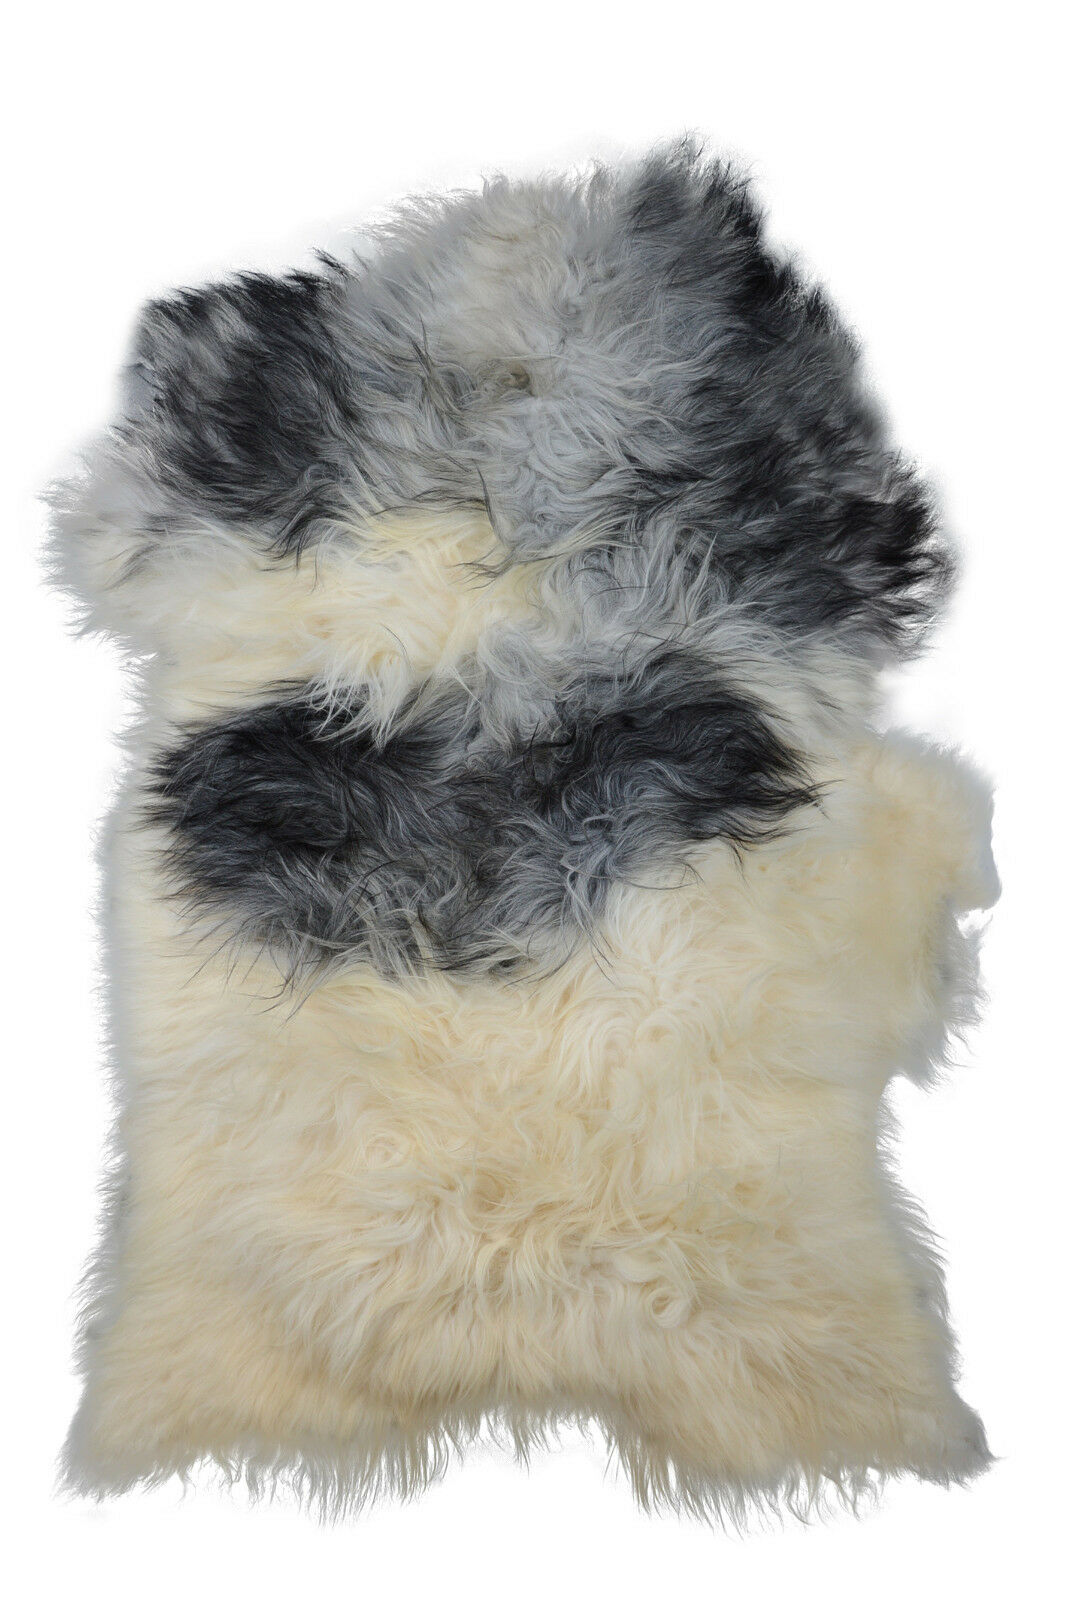 Islanda Agnello Pecora Pelliccia Pelle Tappeto Lambskin SHEEPSKIN 135x95cm